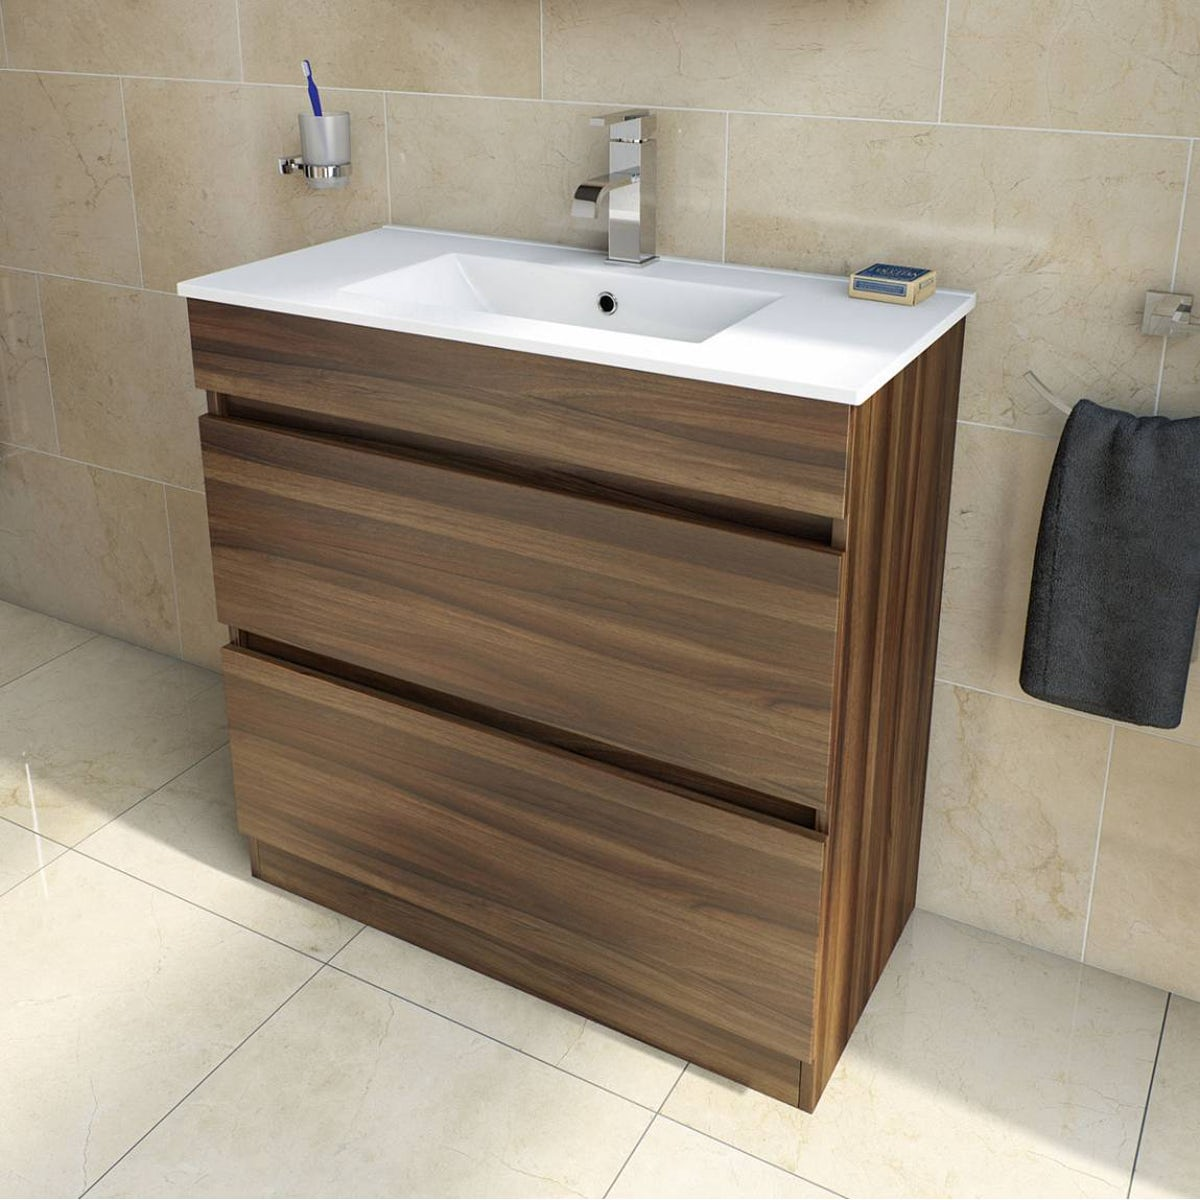 Plan Walnut Vanity Drawer Unit And Basin 800mm